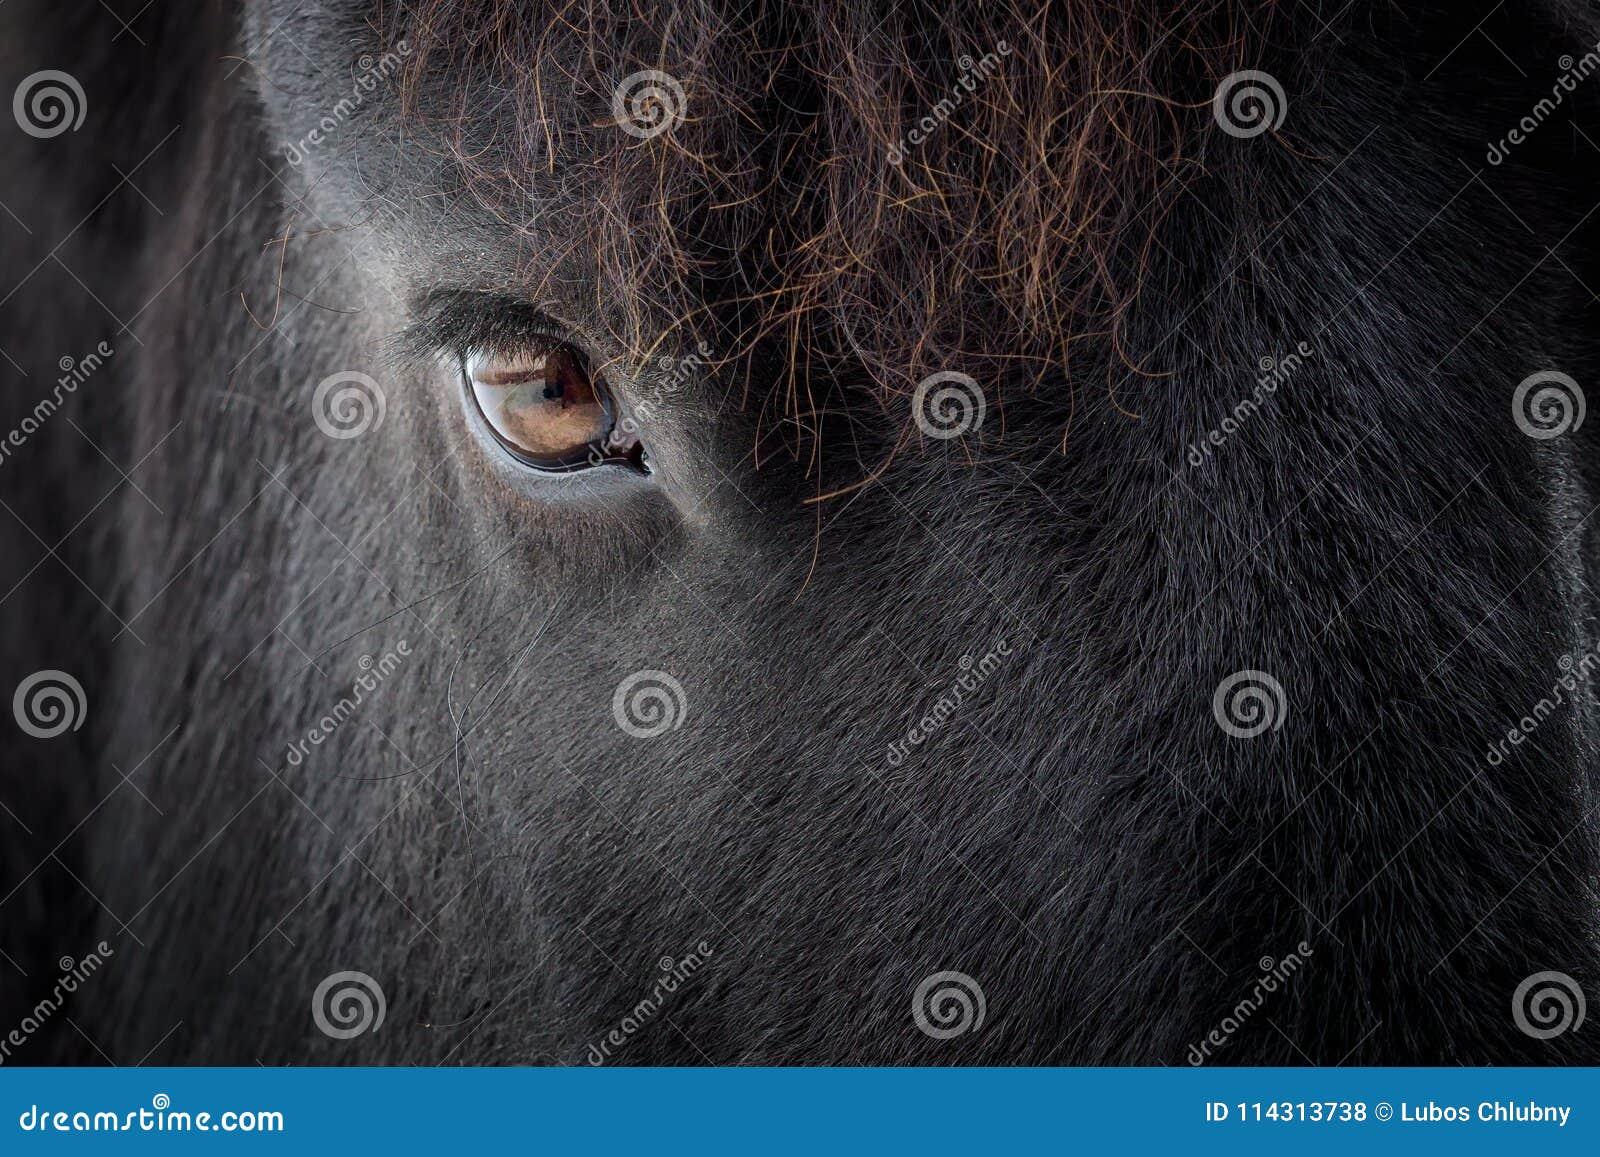 Eye of a friesian horse